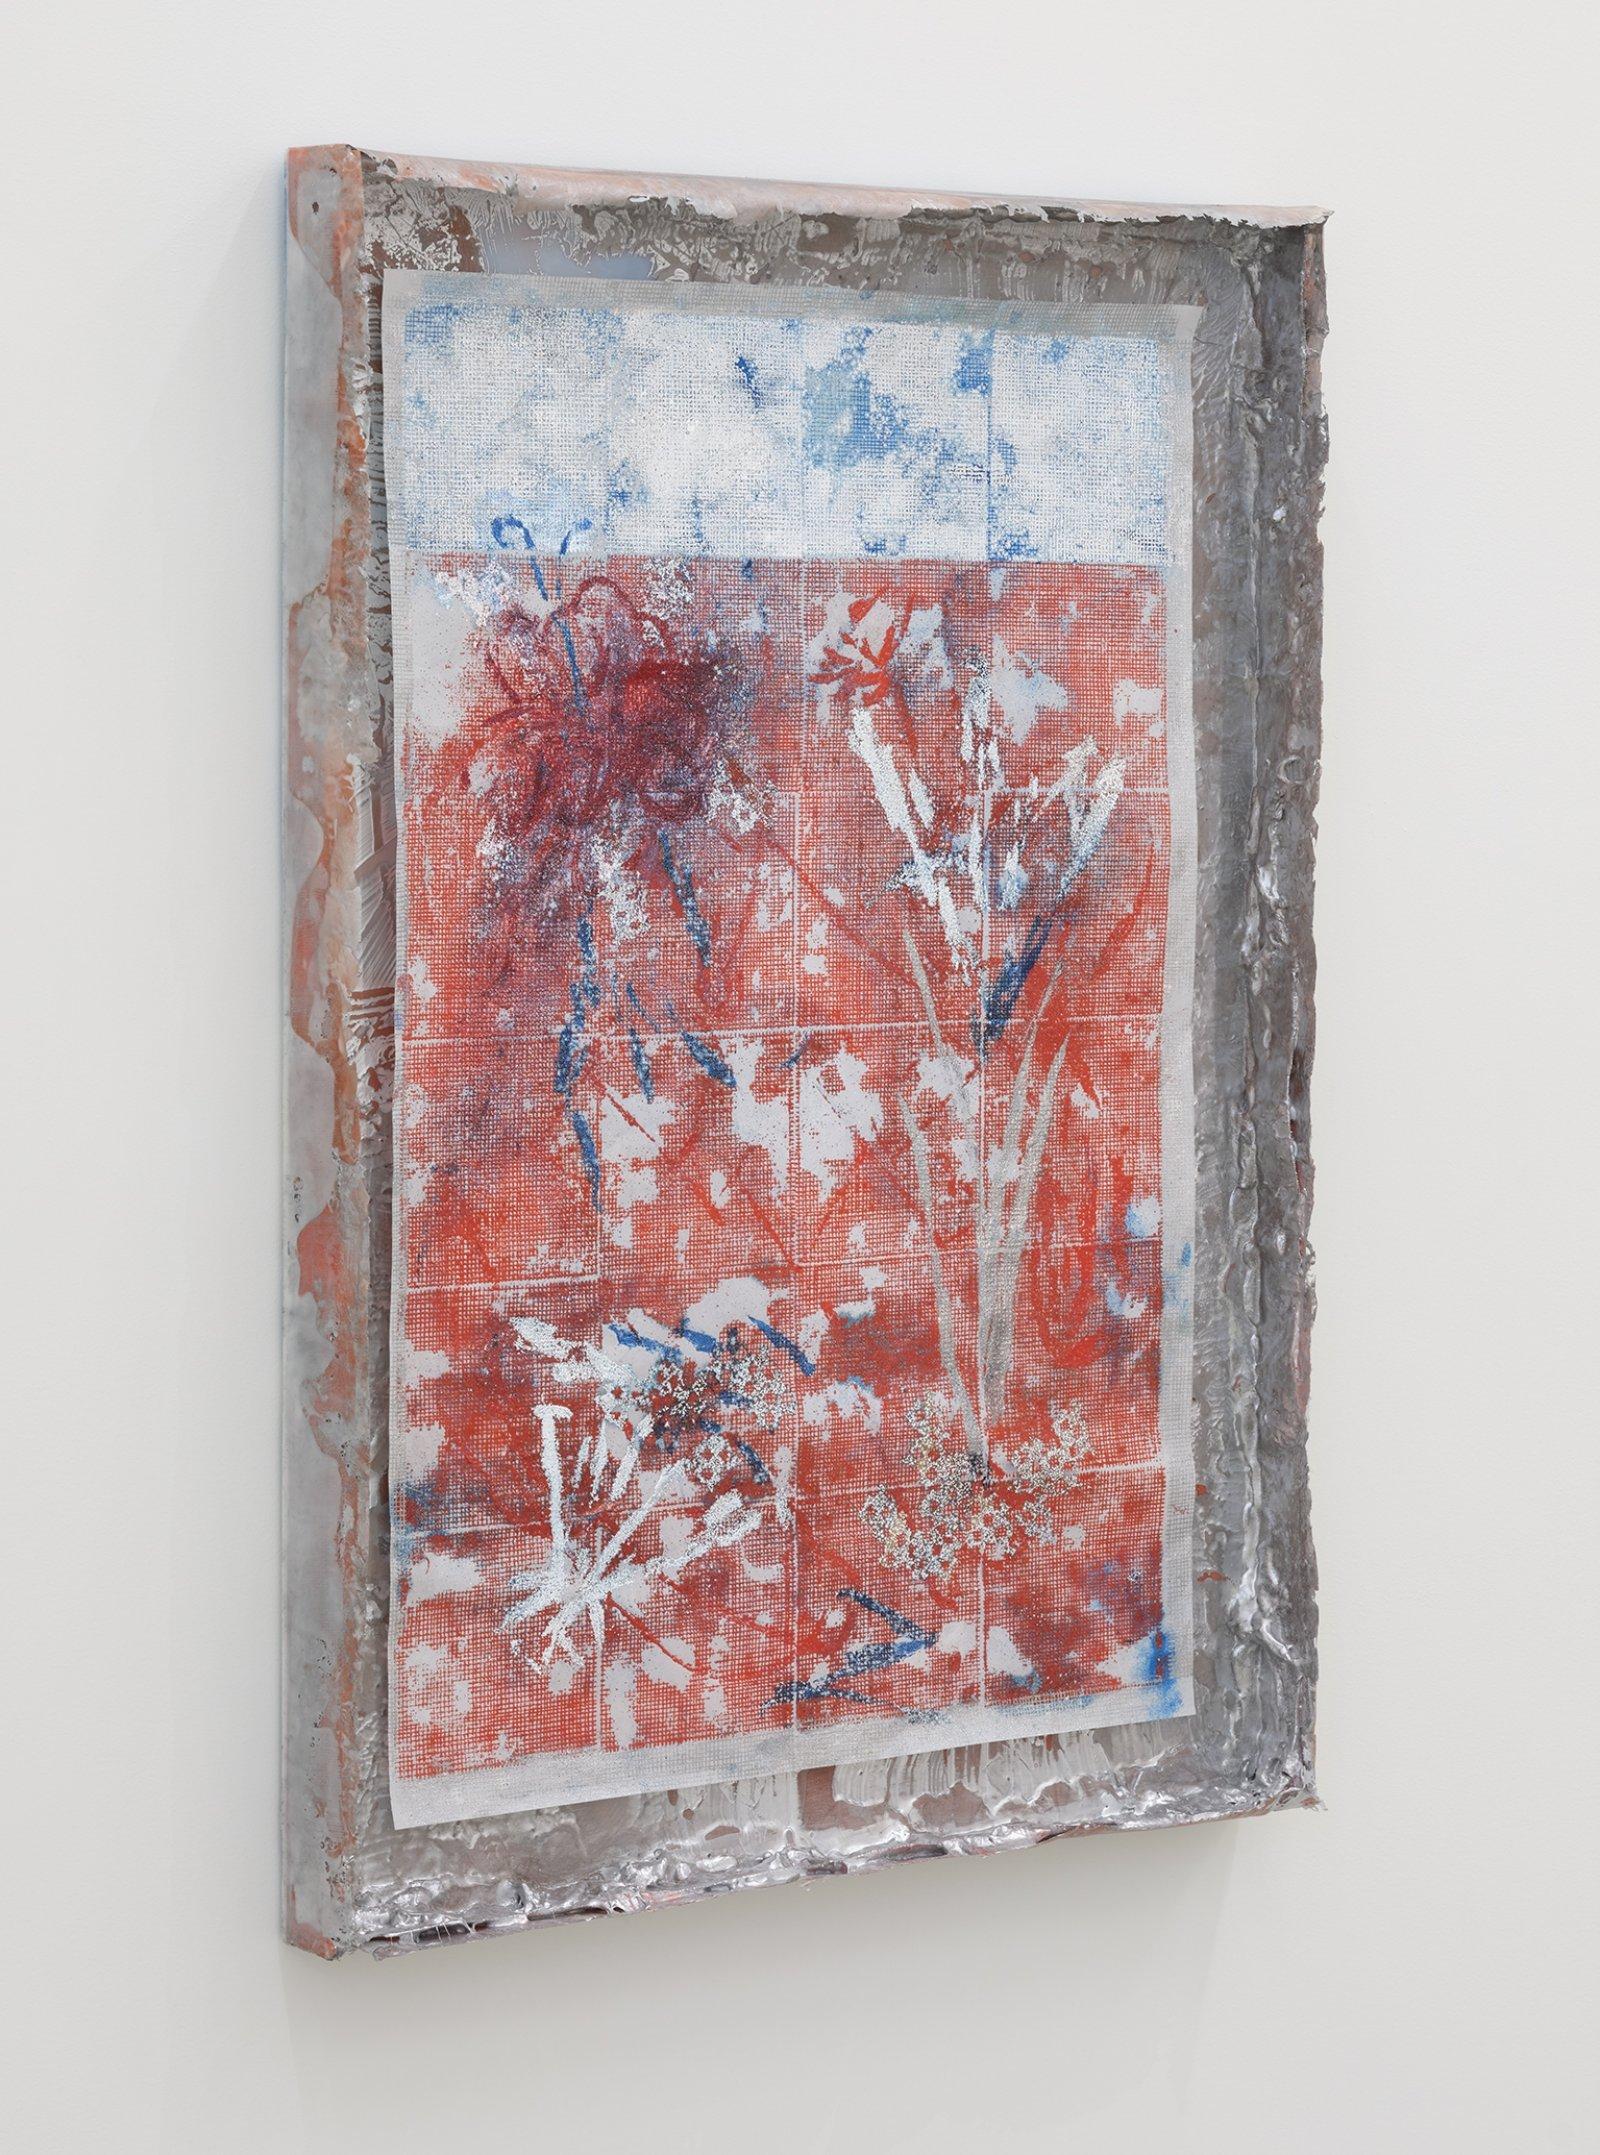 Rebecca Brewer, Live Resin: Salt Burn, 2019, urethane resin, aluminum mesh, pigment, plexiglas, embossing powder on vellum, 41 x 29 in. (104 x 74 cm)